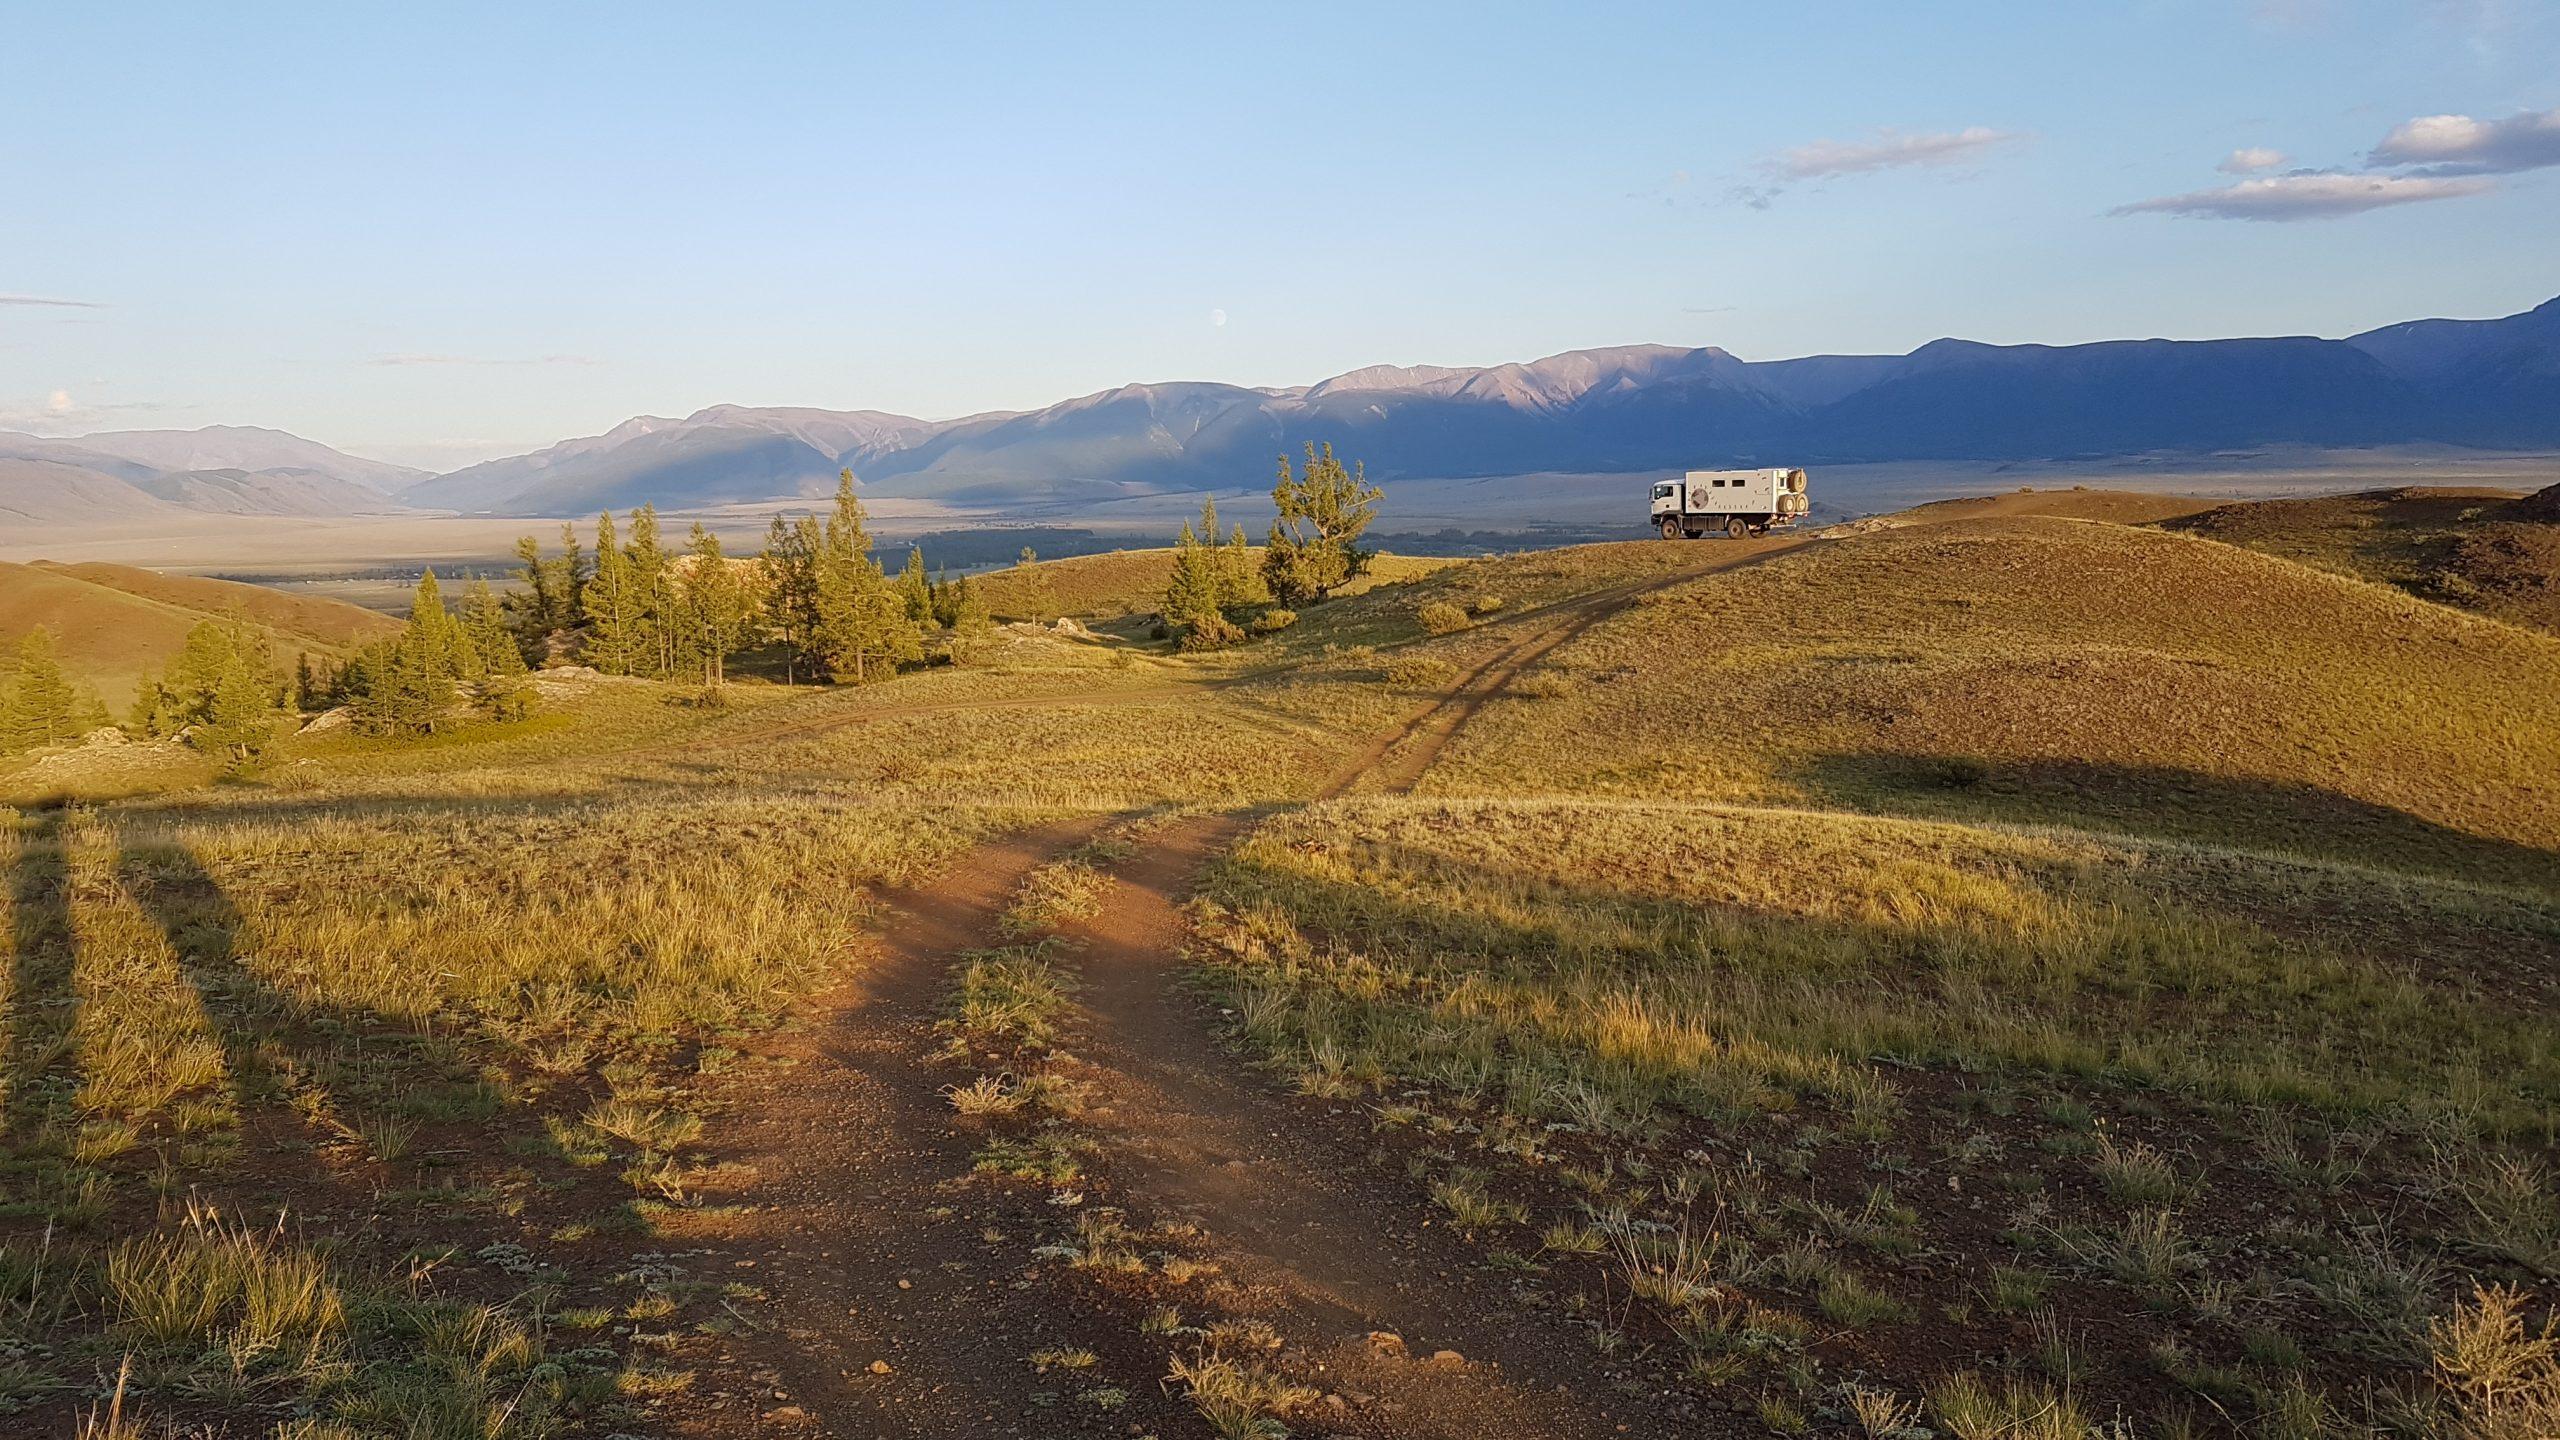 23 août : L'Altaï russe